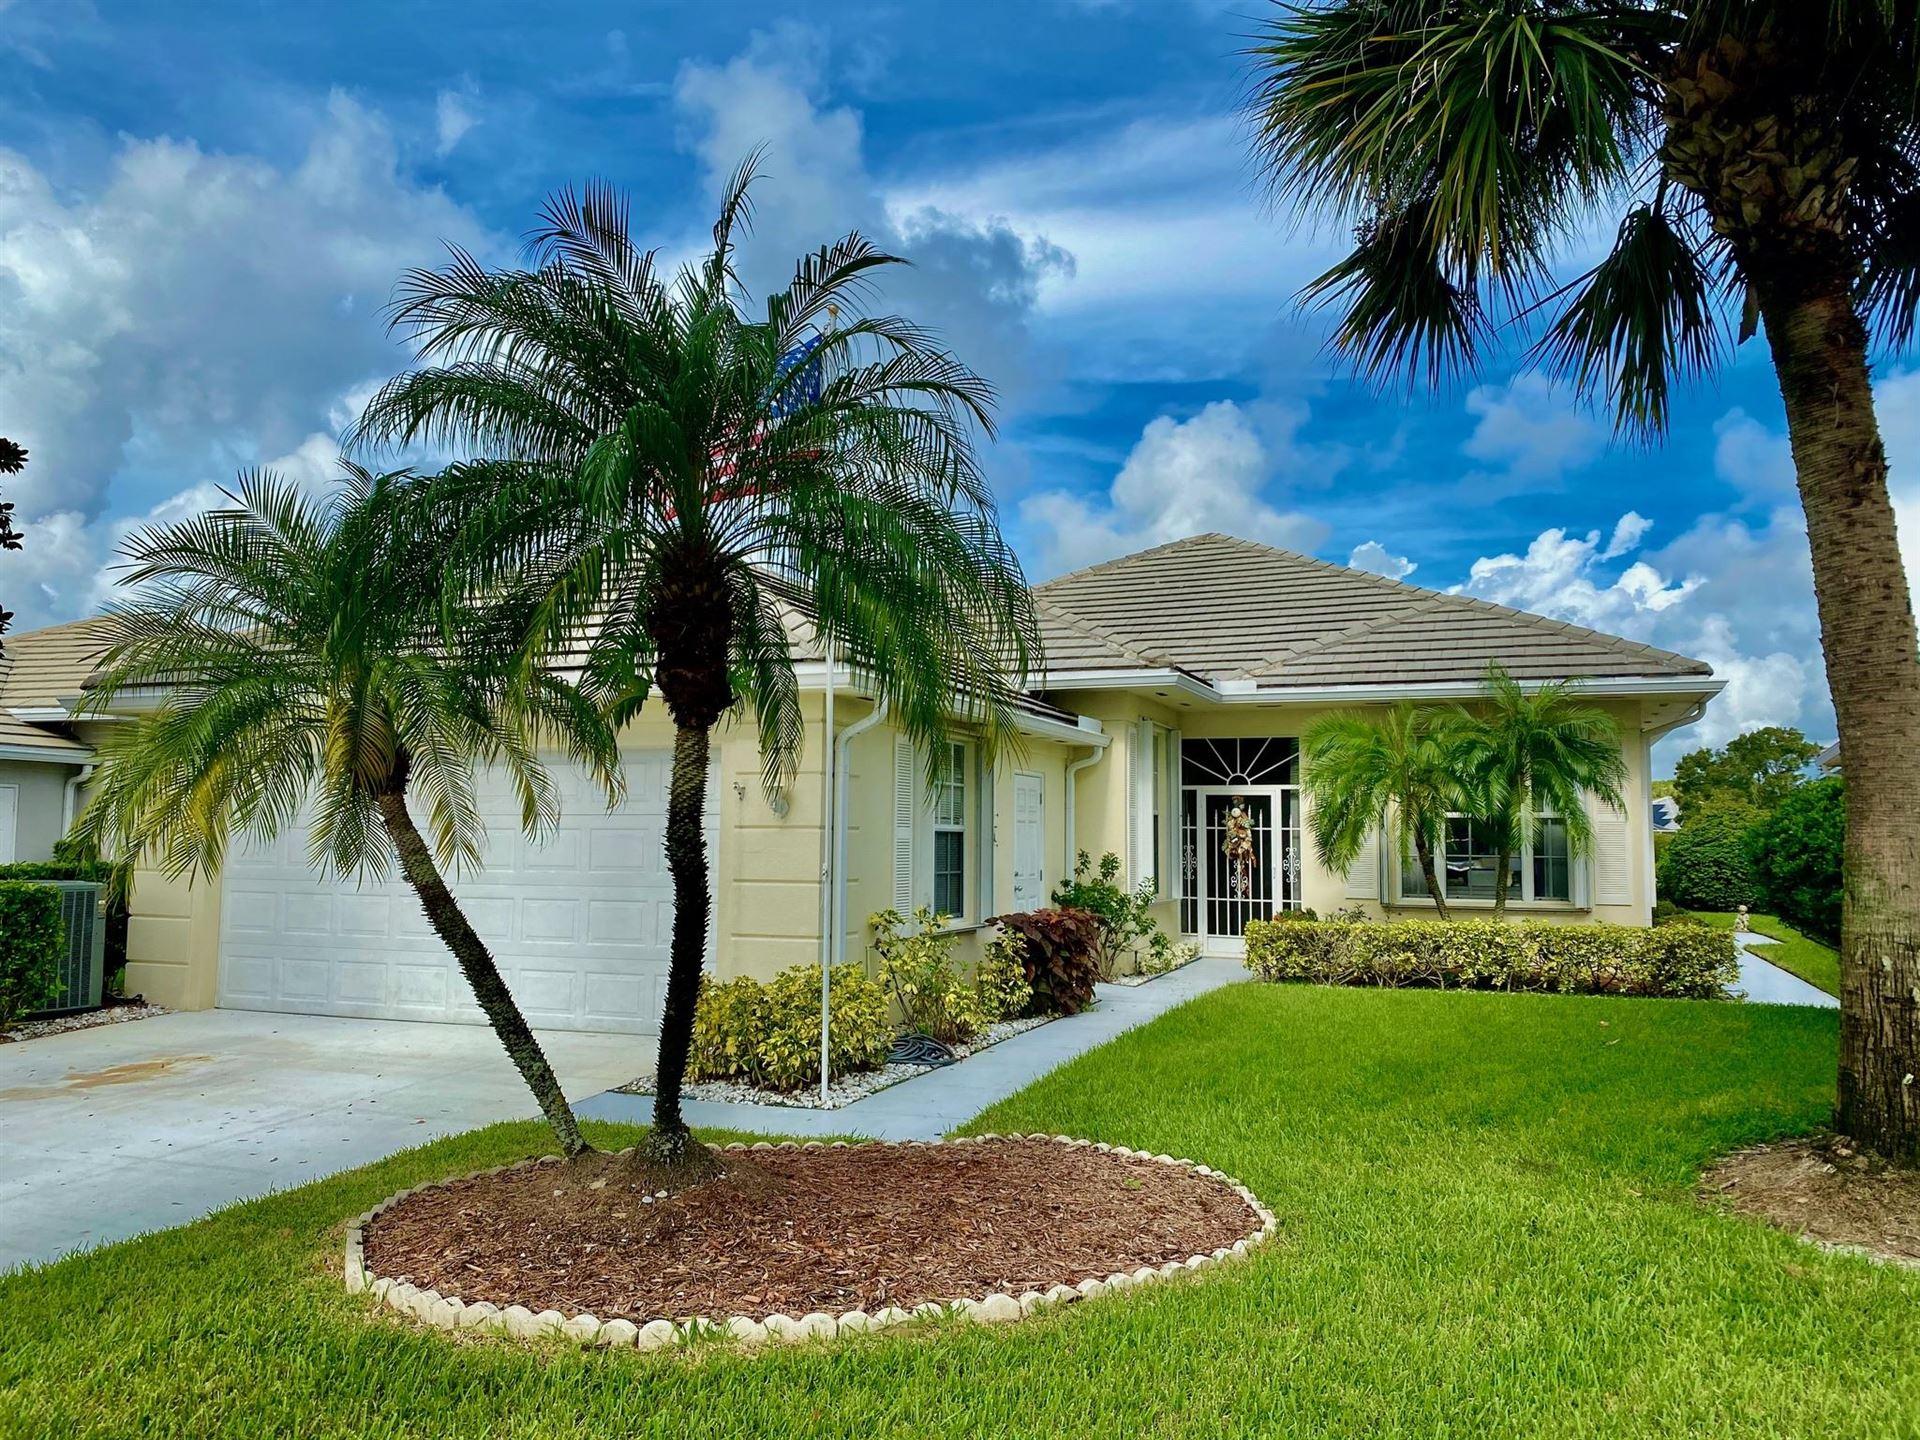 344 NW Bentley Circle, Port Saint Lucie, FL 34986 - #: RX-10663501